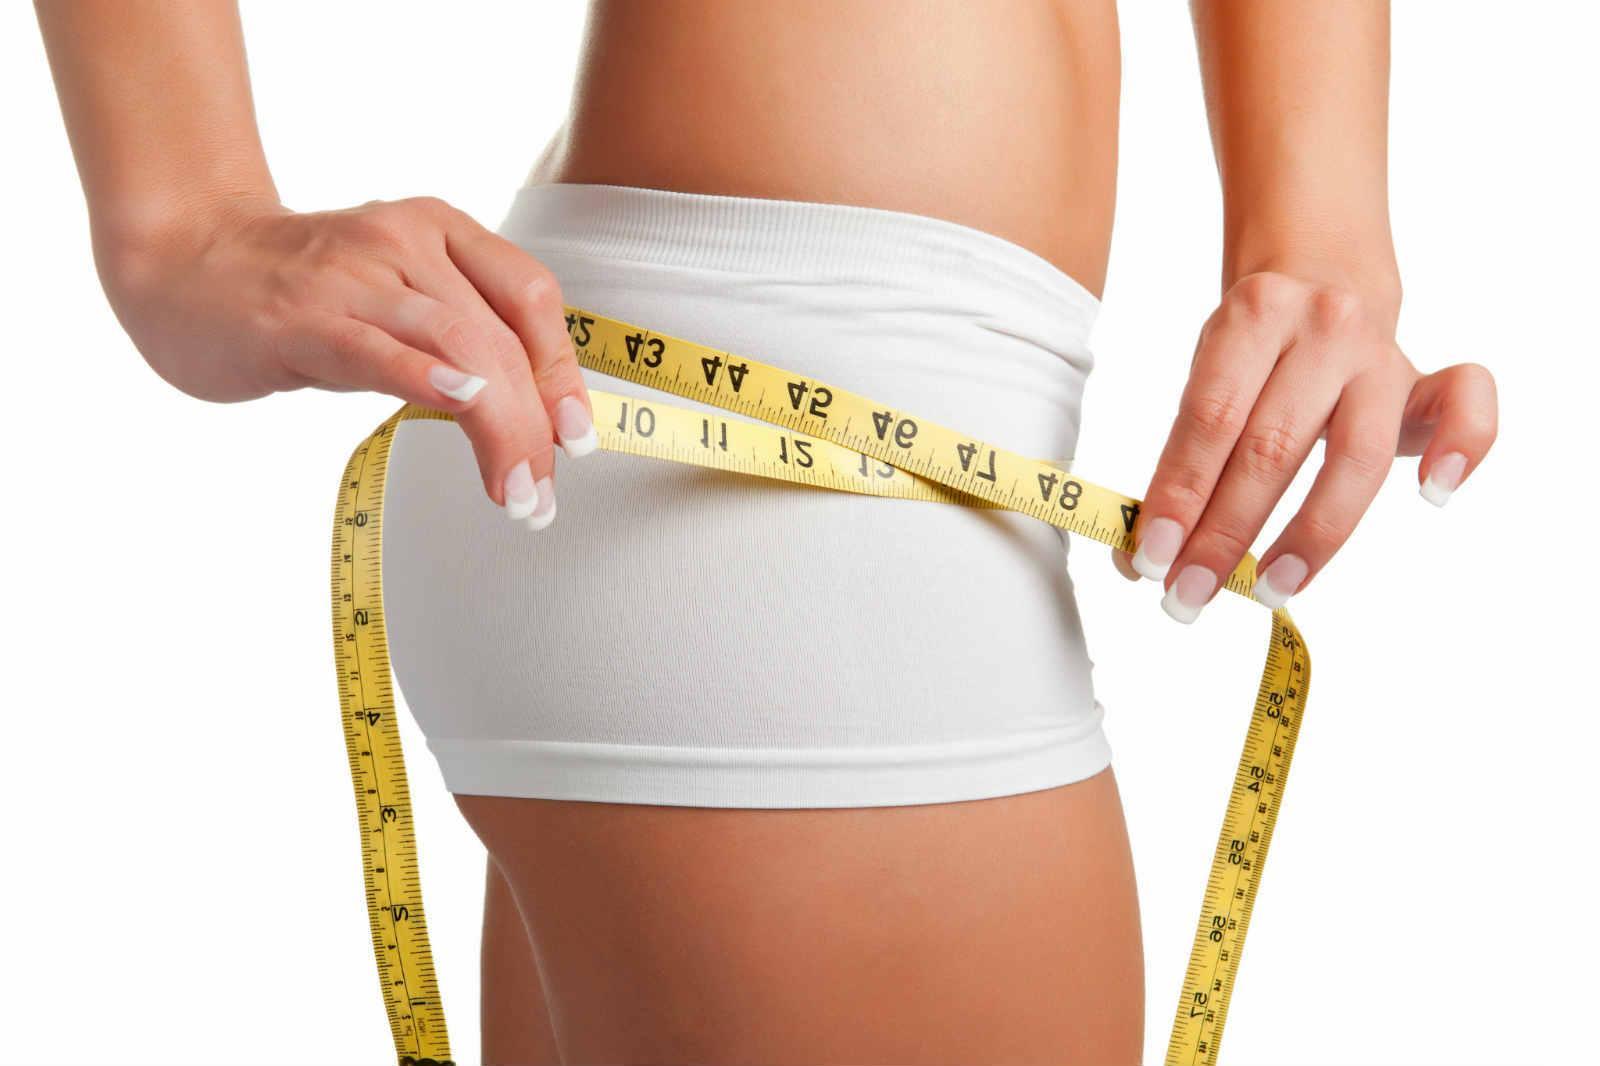 Dieta Circadiana Para Perder Peso Sem Maltratar o Corpo